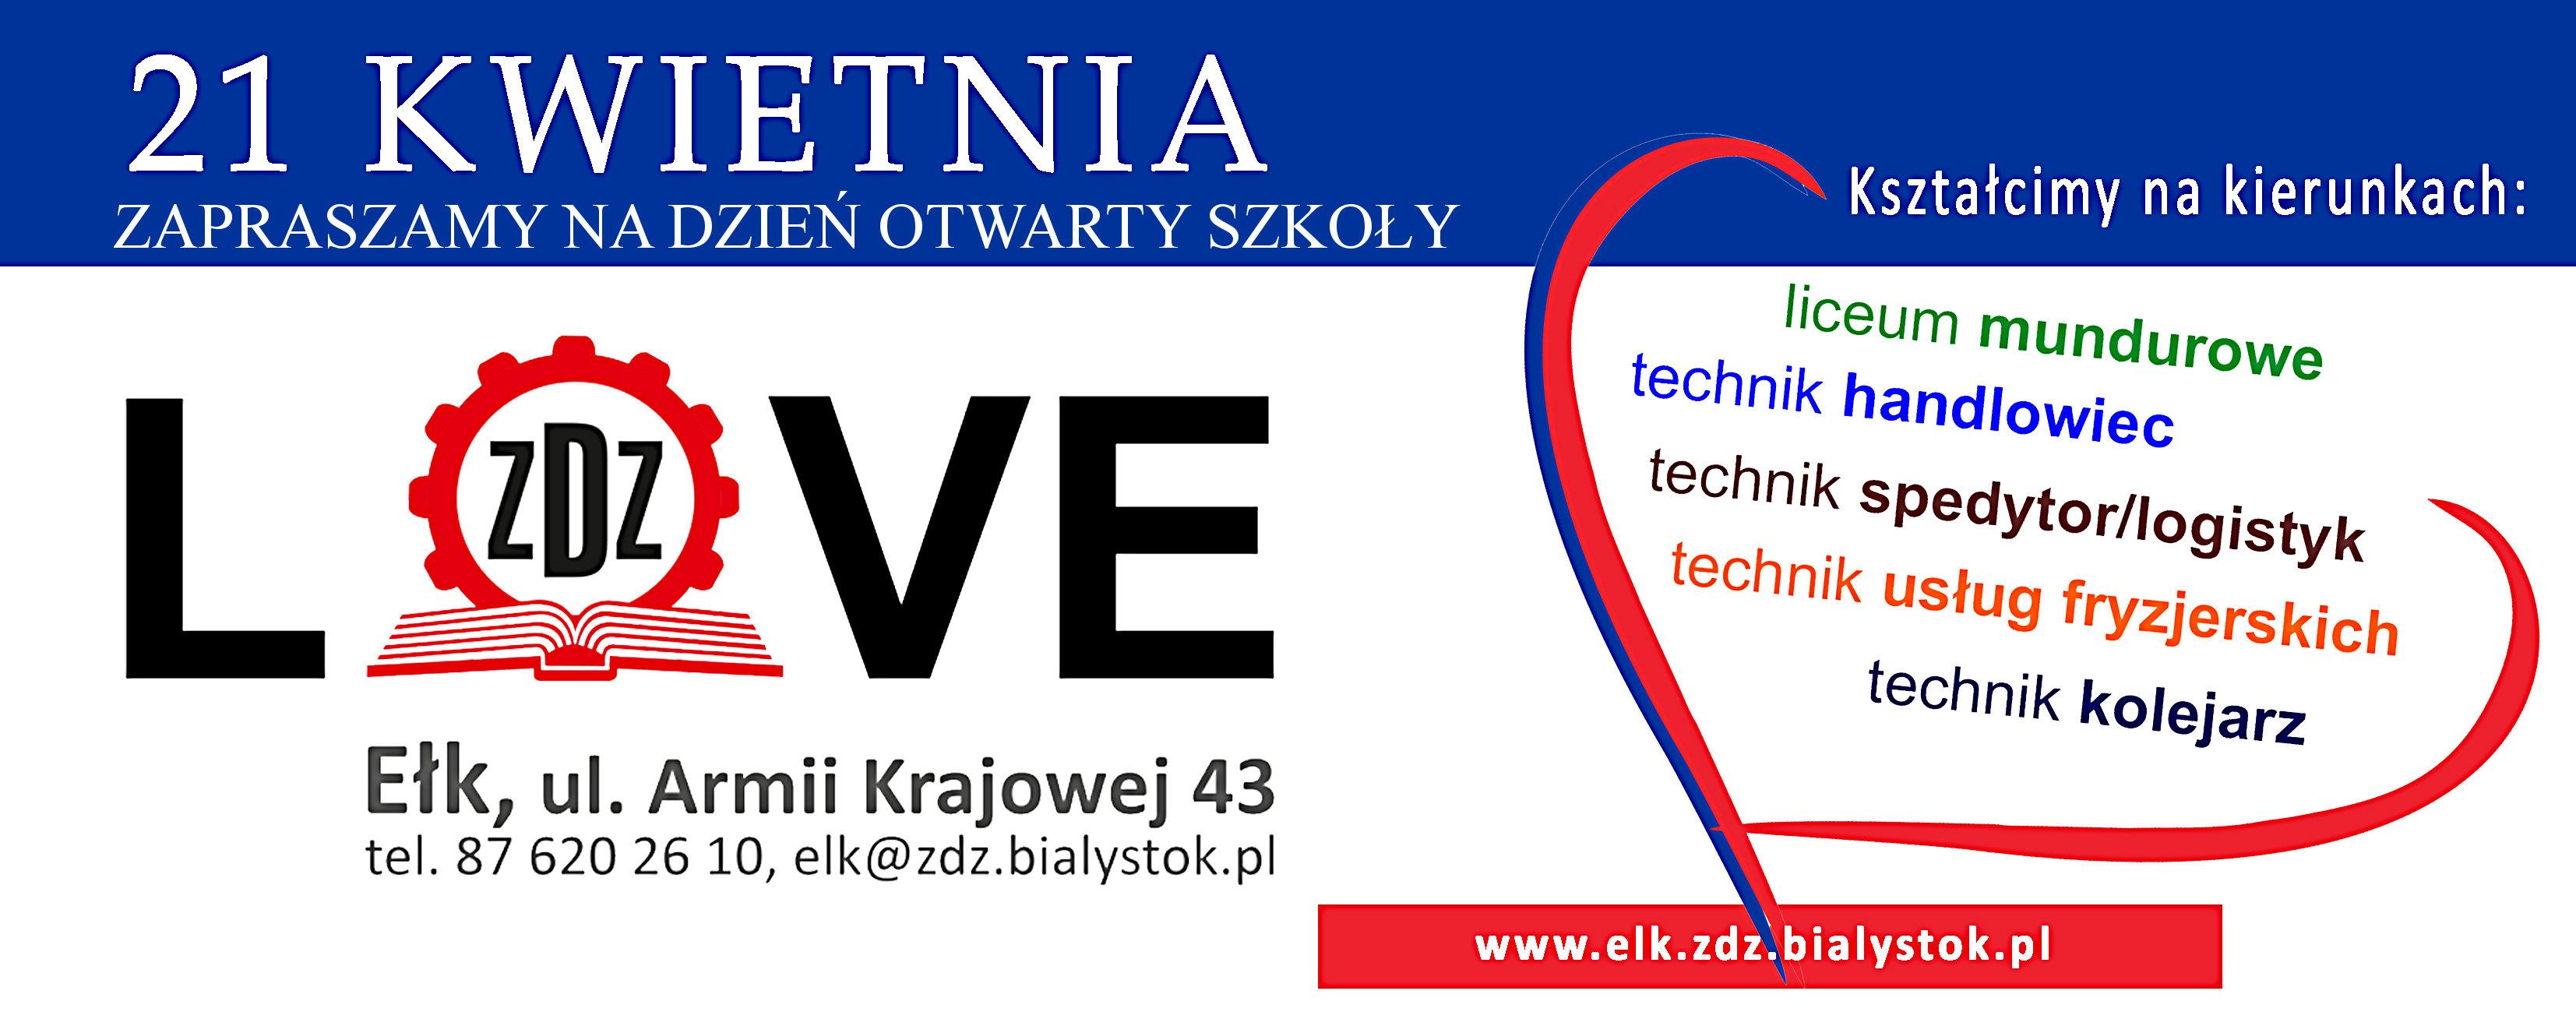 http://m.wm.pl/2018/03/orig/oferta-dni-otwarte-455415.jpg